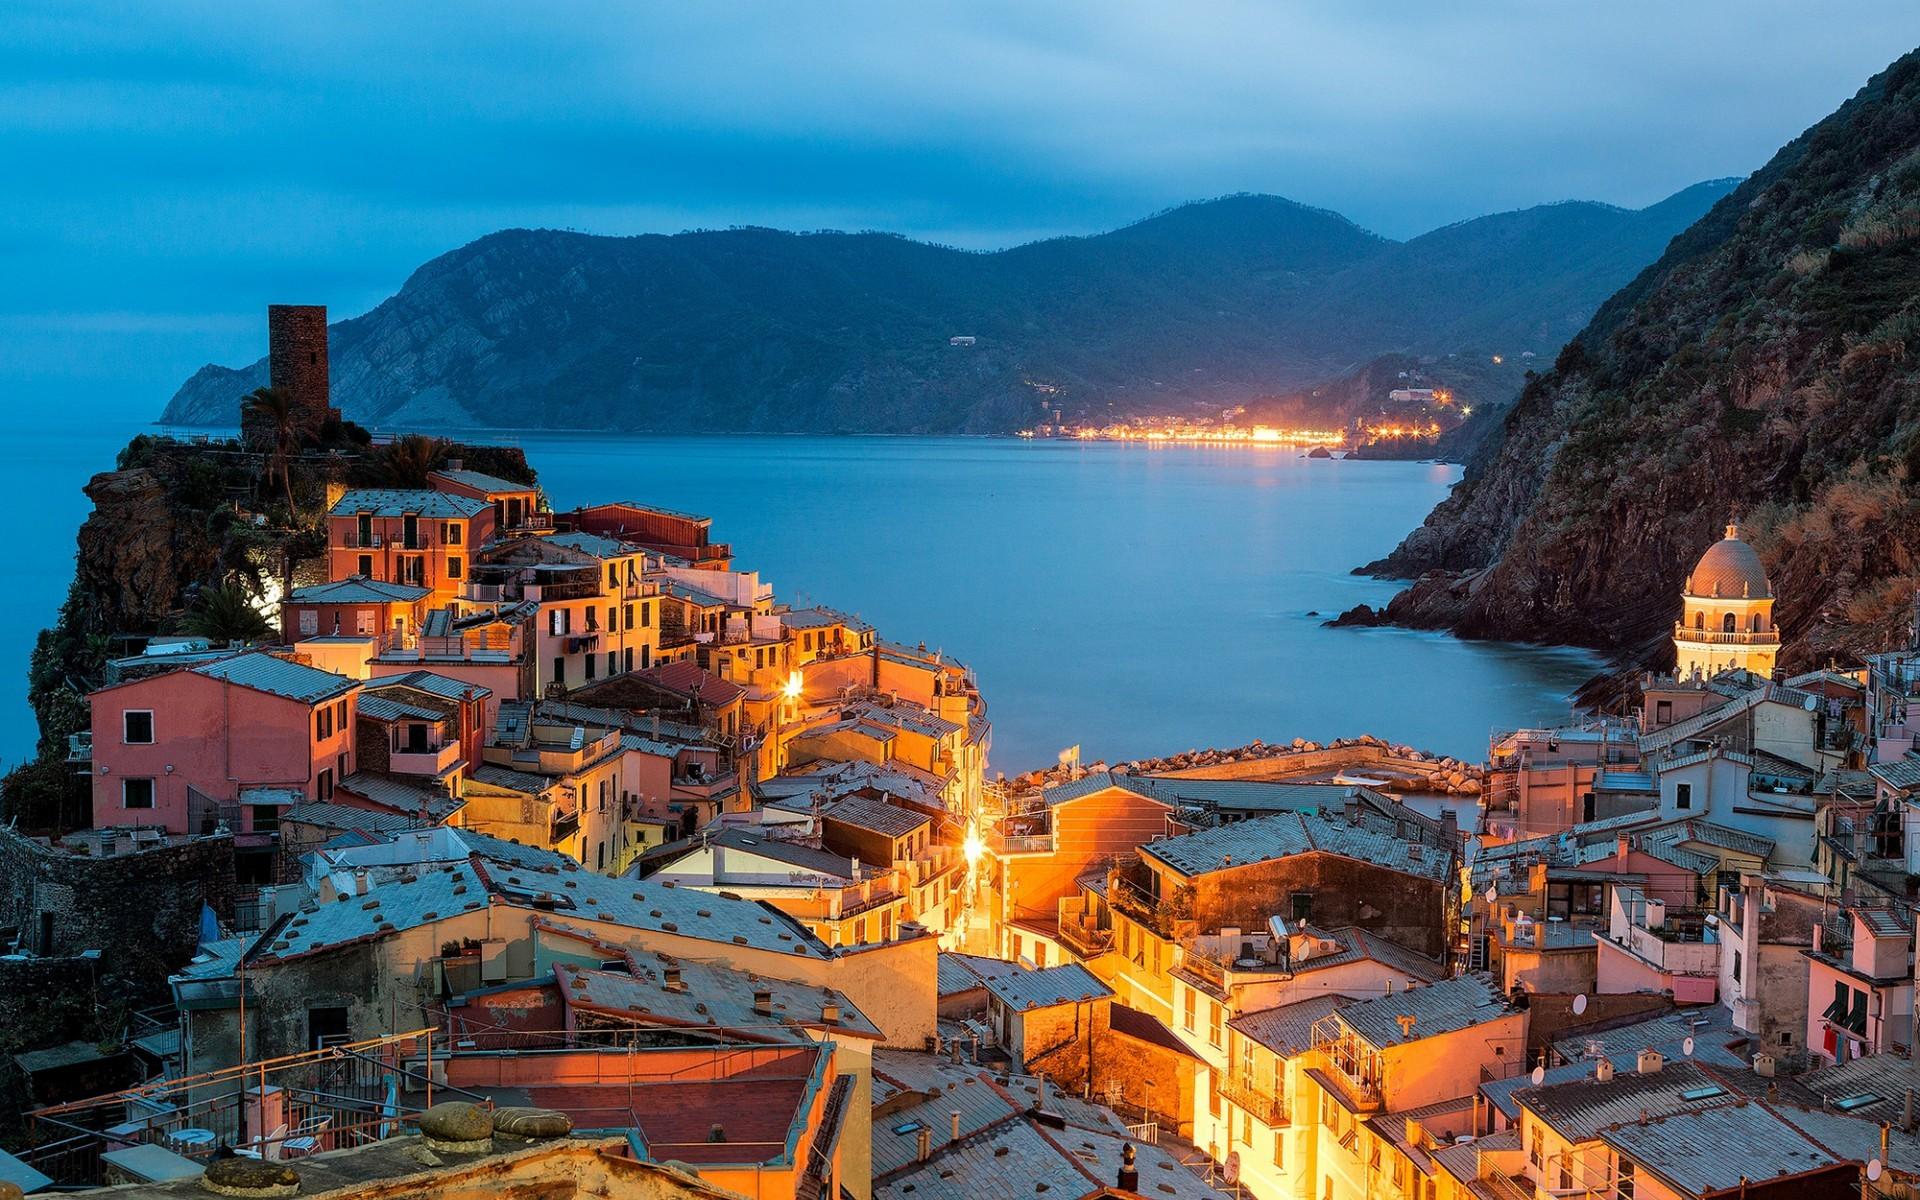 Beleuchtung Terre | Hintergrundbilder Beleuchtung Meer Stadtbild Italien Bucht